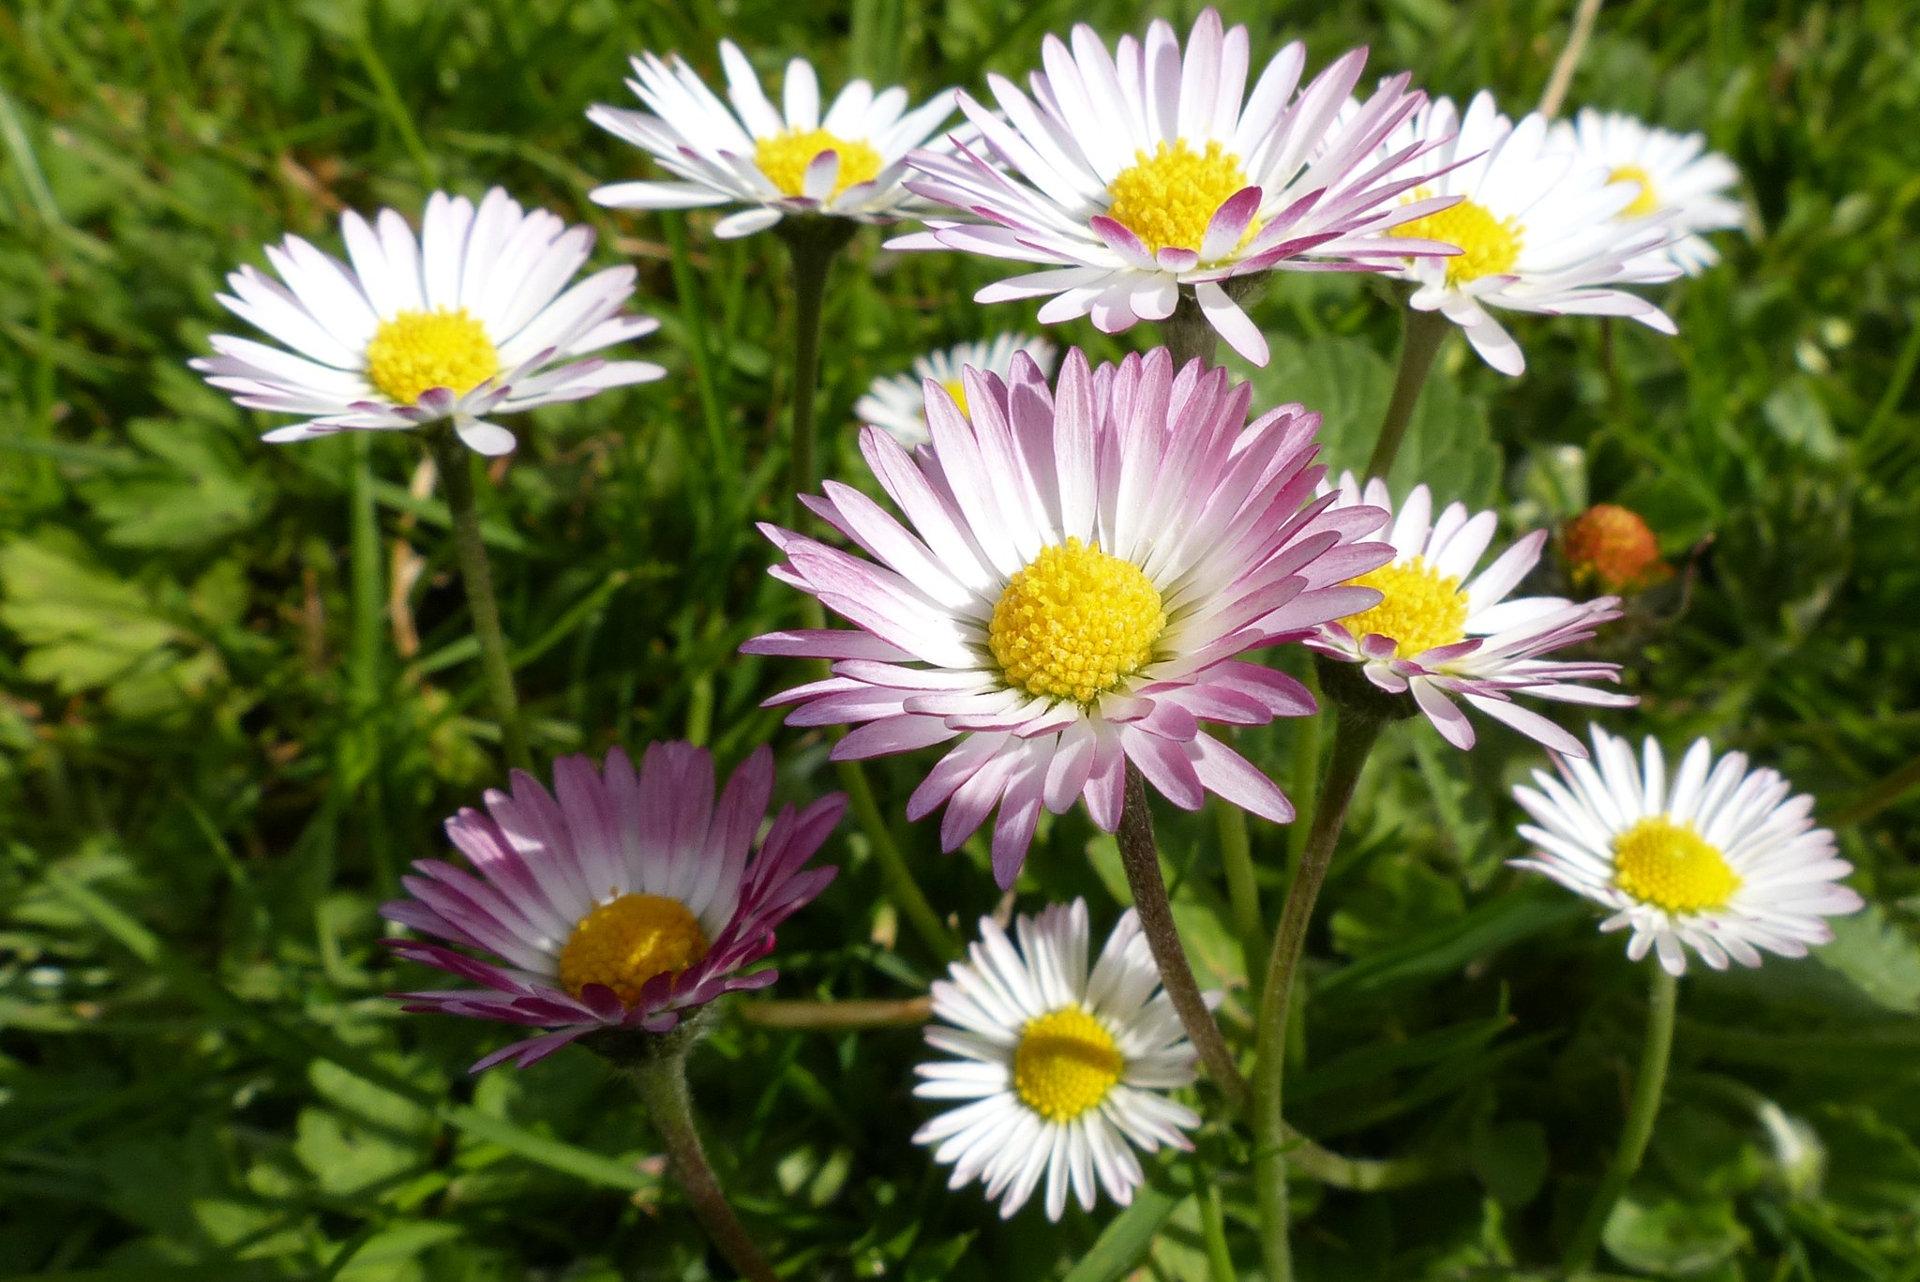 paquerette-sauvage-jardin-urbain-pollinisation